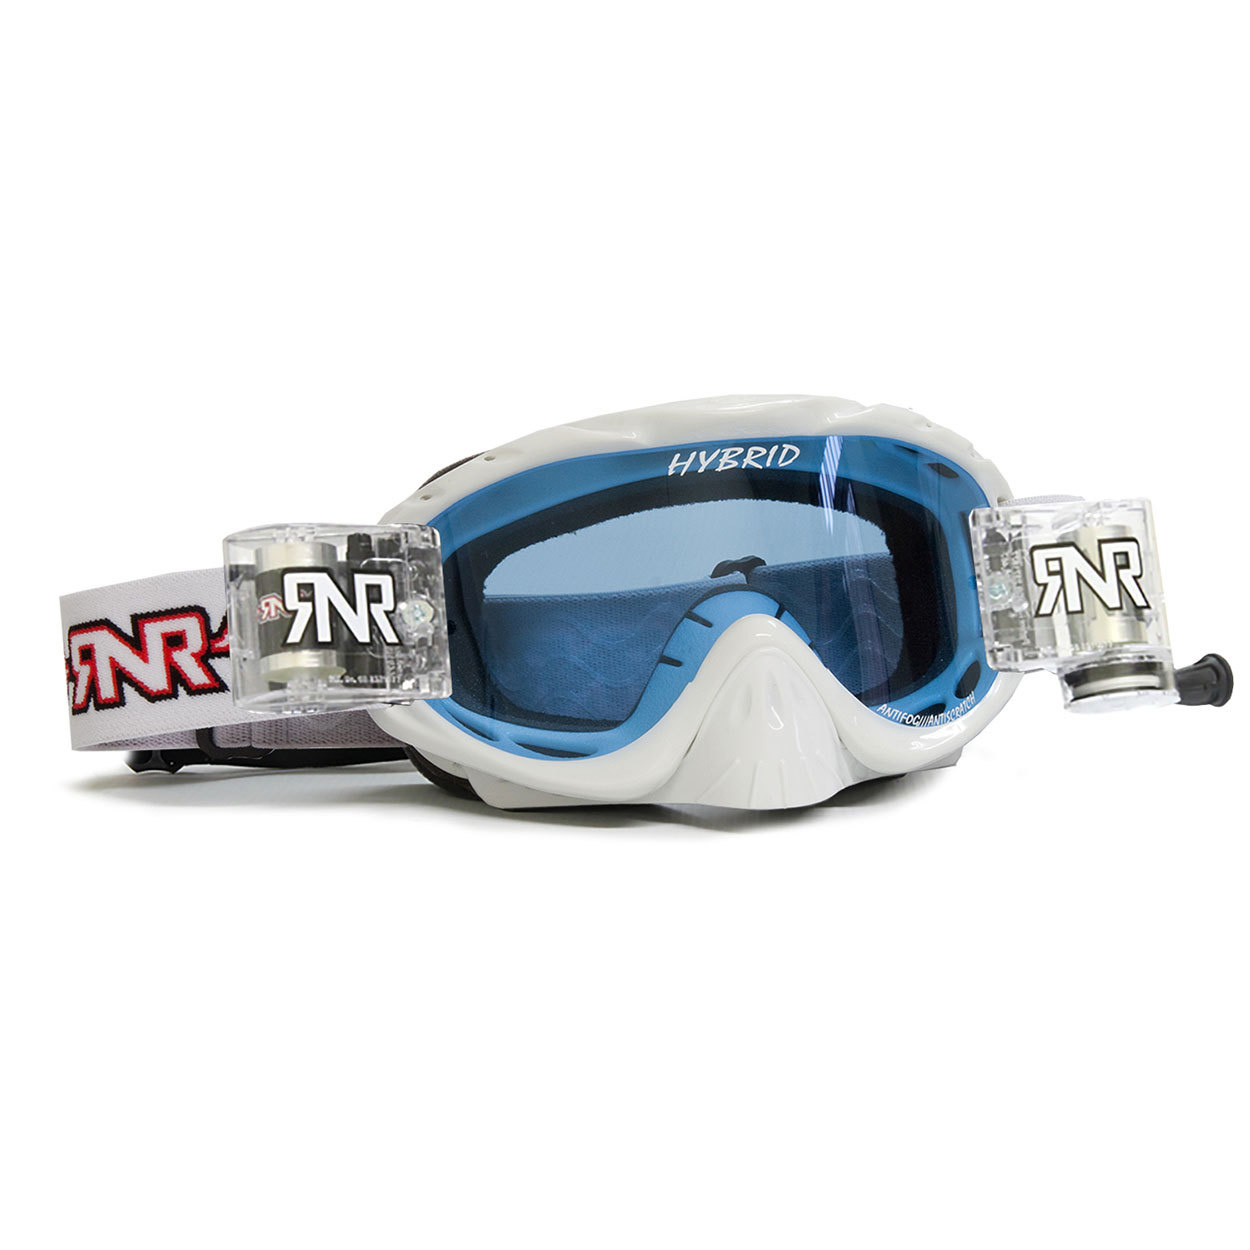 RNR Crossbril Racerpack Hybrid - Wit